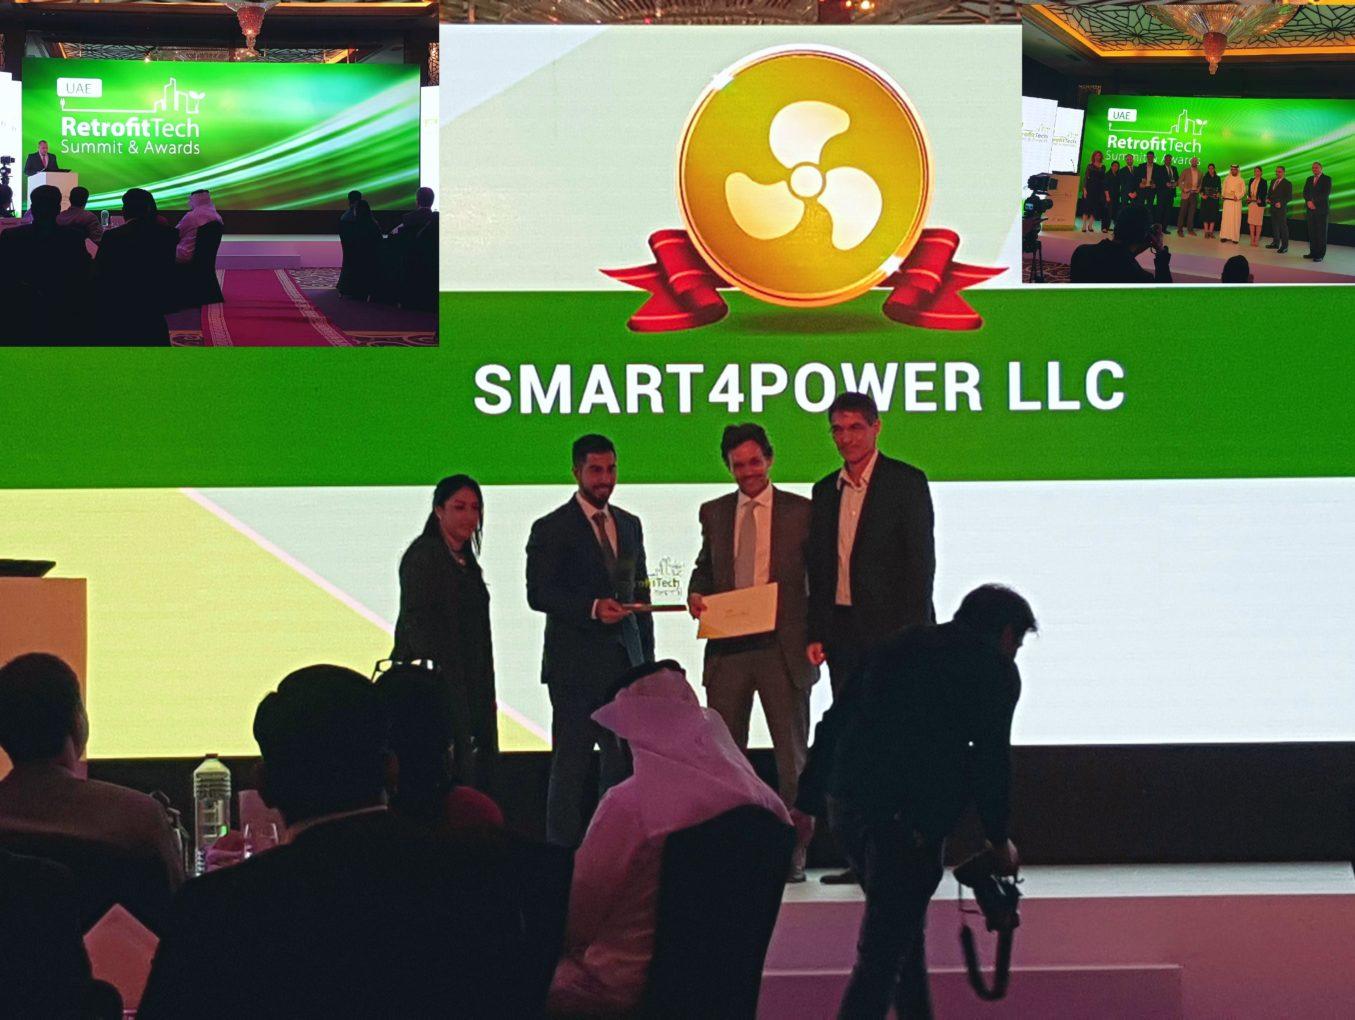 Smart4power wins big at Retrofitech awards 2017